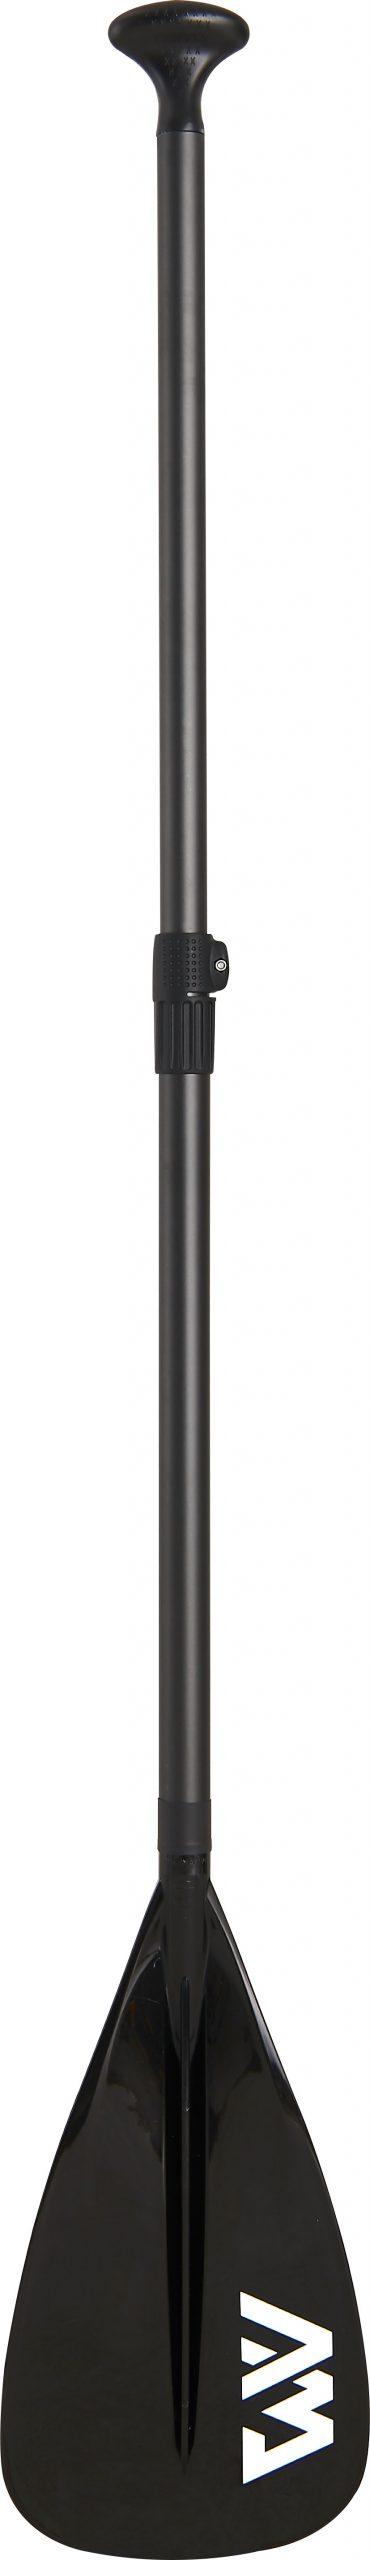 AQUA MARINA-Product-CANOE-B0302946-(2)